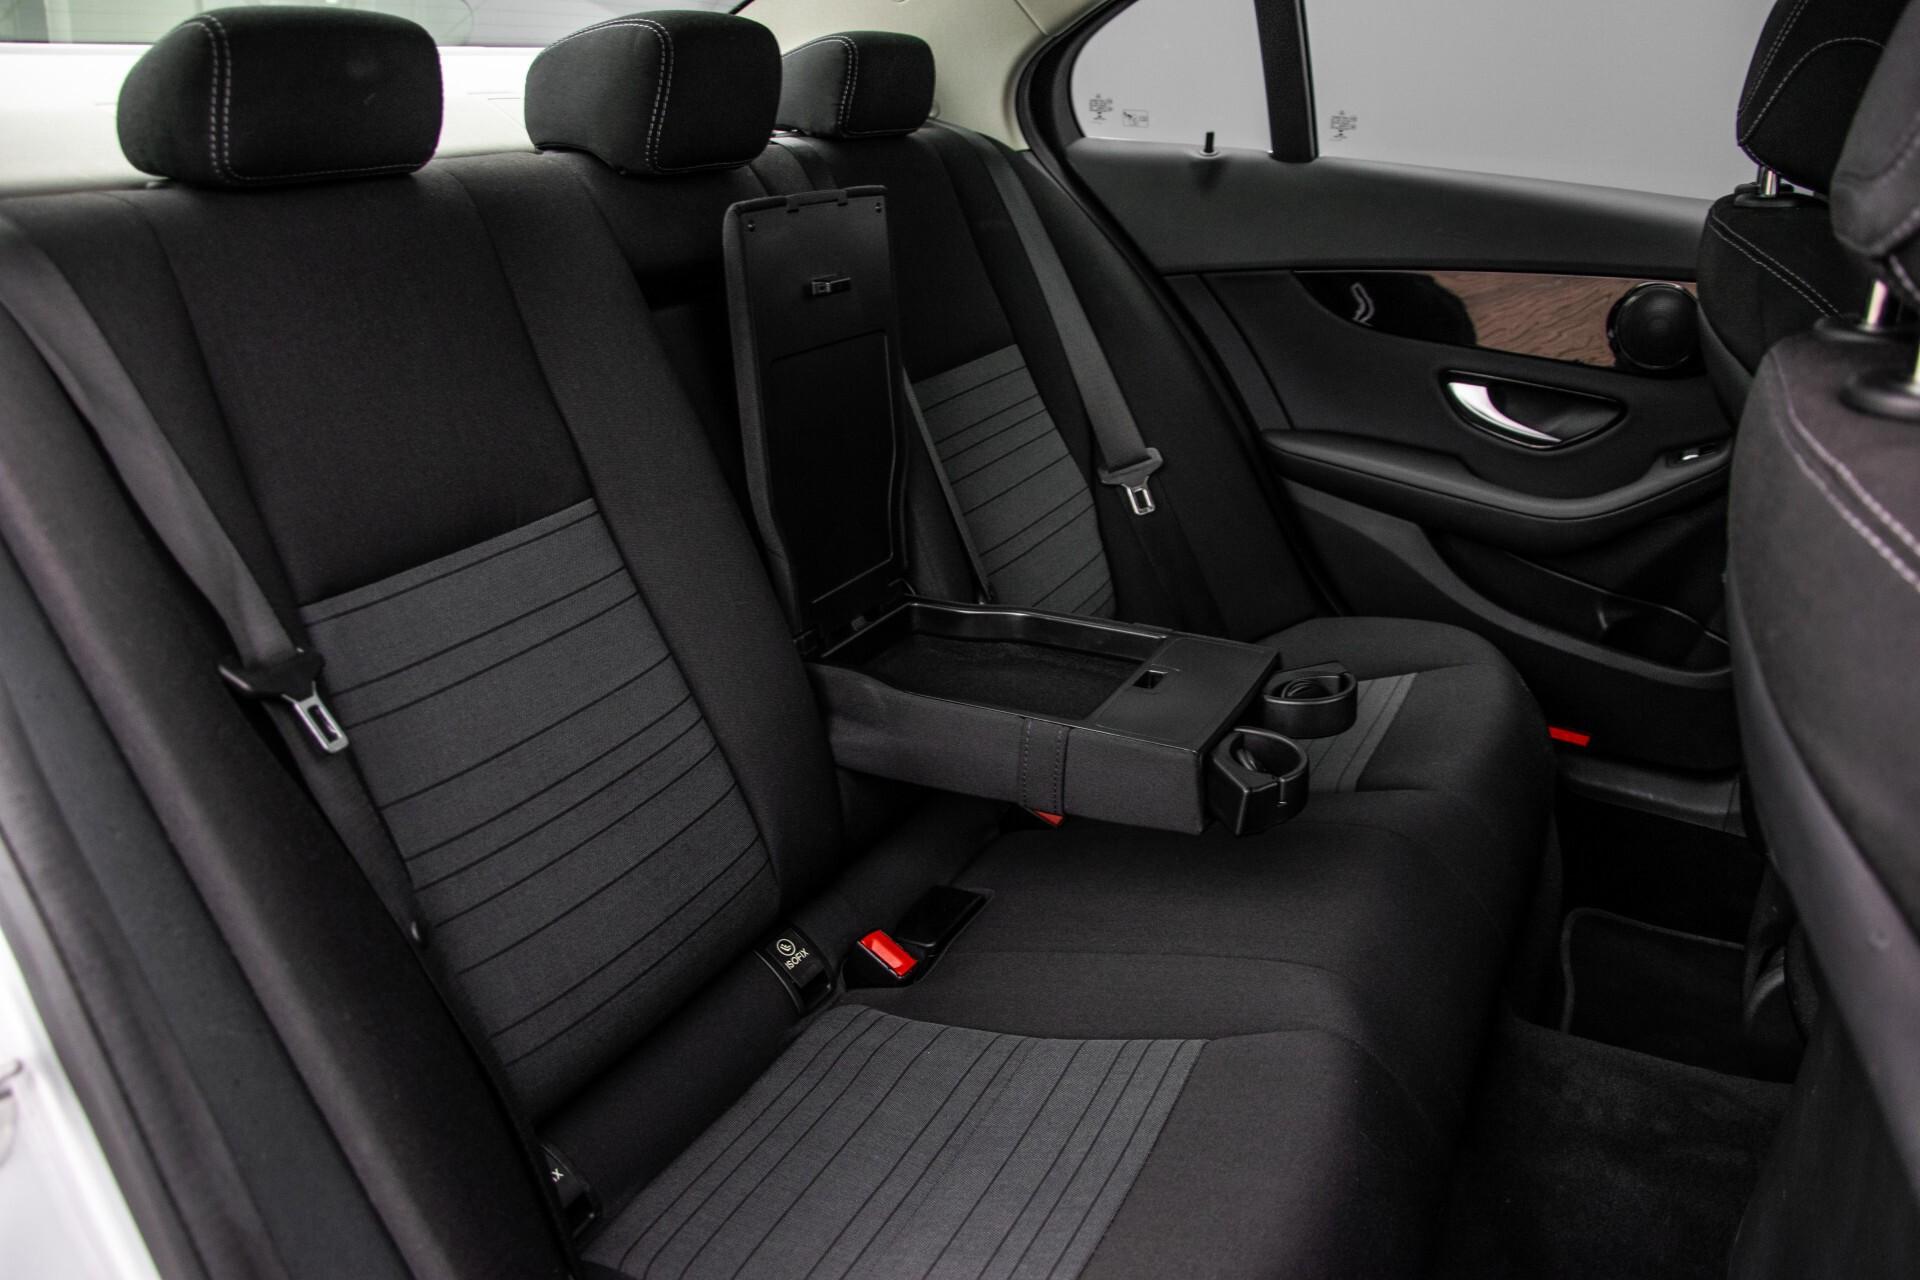 Mercedes-Benz C-Klasse 180 Bluetec Lease Edition Intelligent Light System/Cruise Control/Navi Foto 5